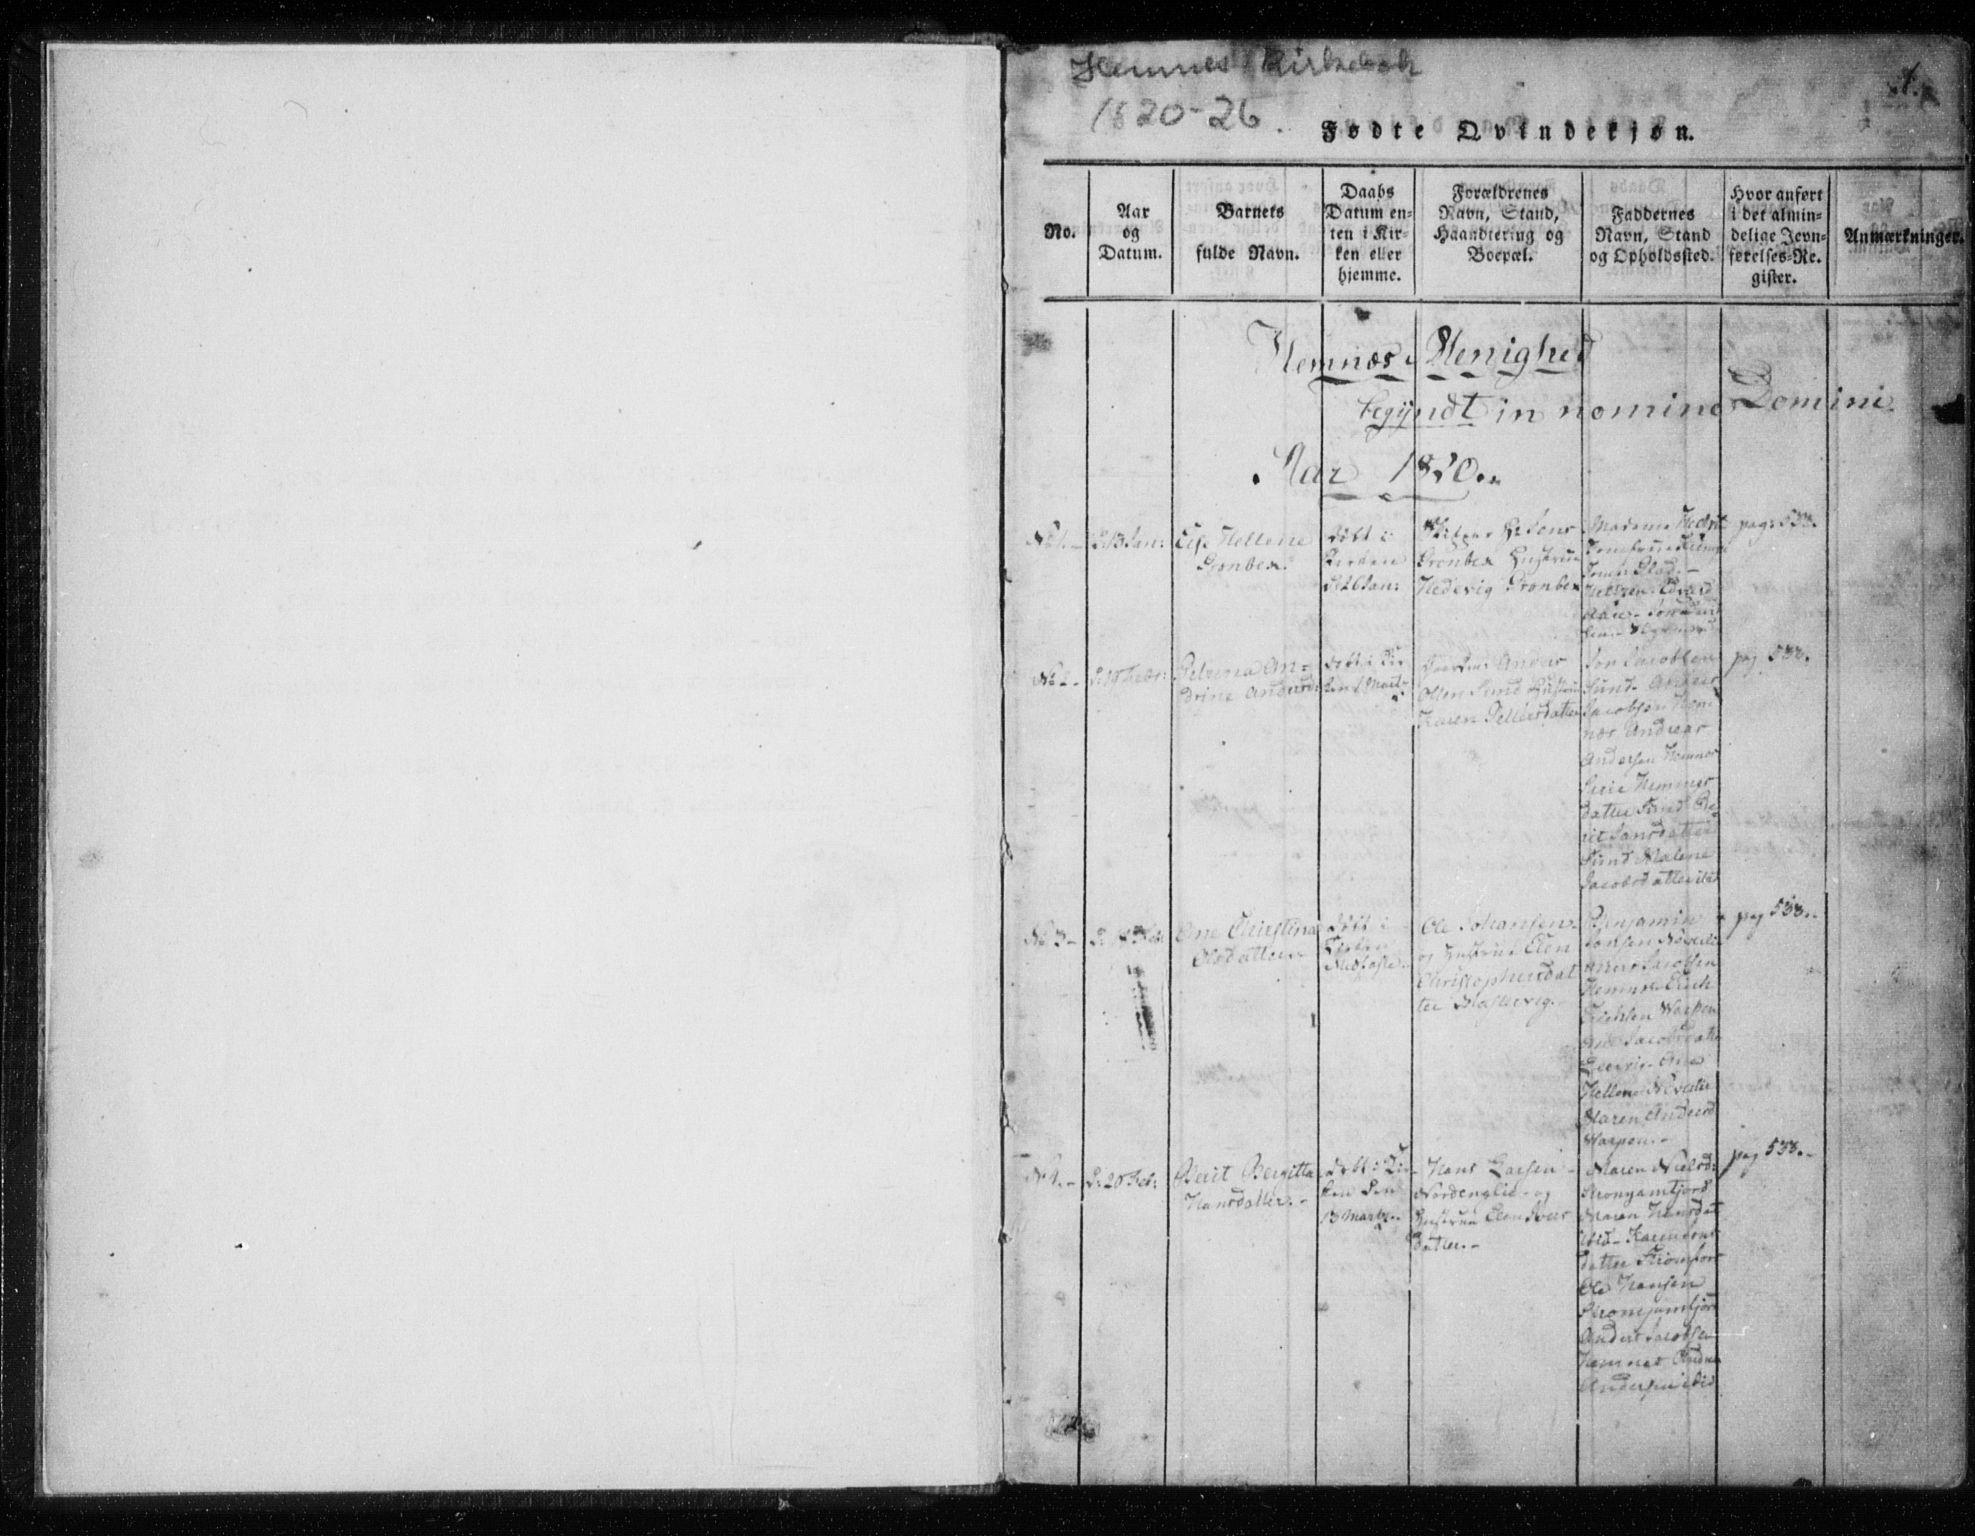 SAT, Ministerialprotokoller, klokkerbøker og fødselsregistre - Nordland, 825/L0353: Ministerialbok nr. 825A07, 1820-1826, s. 1